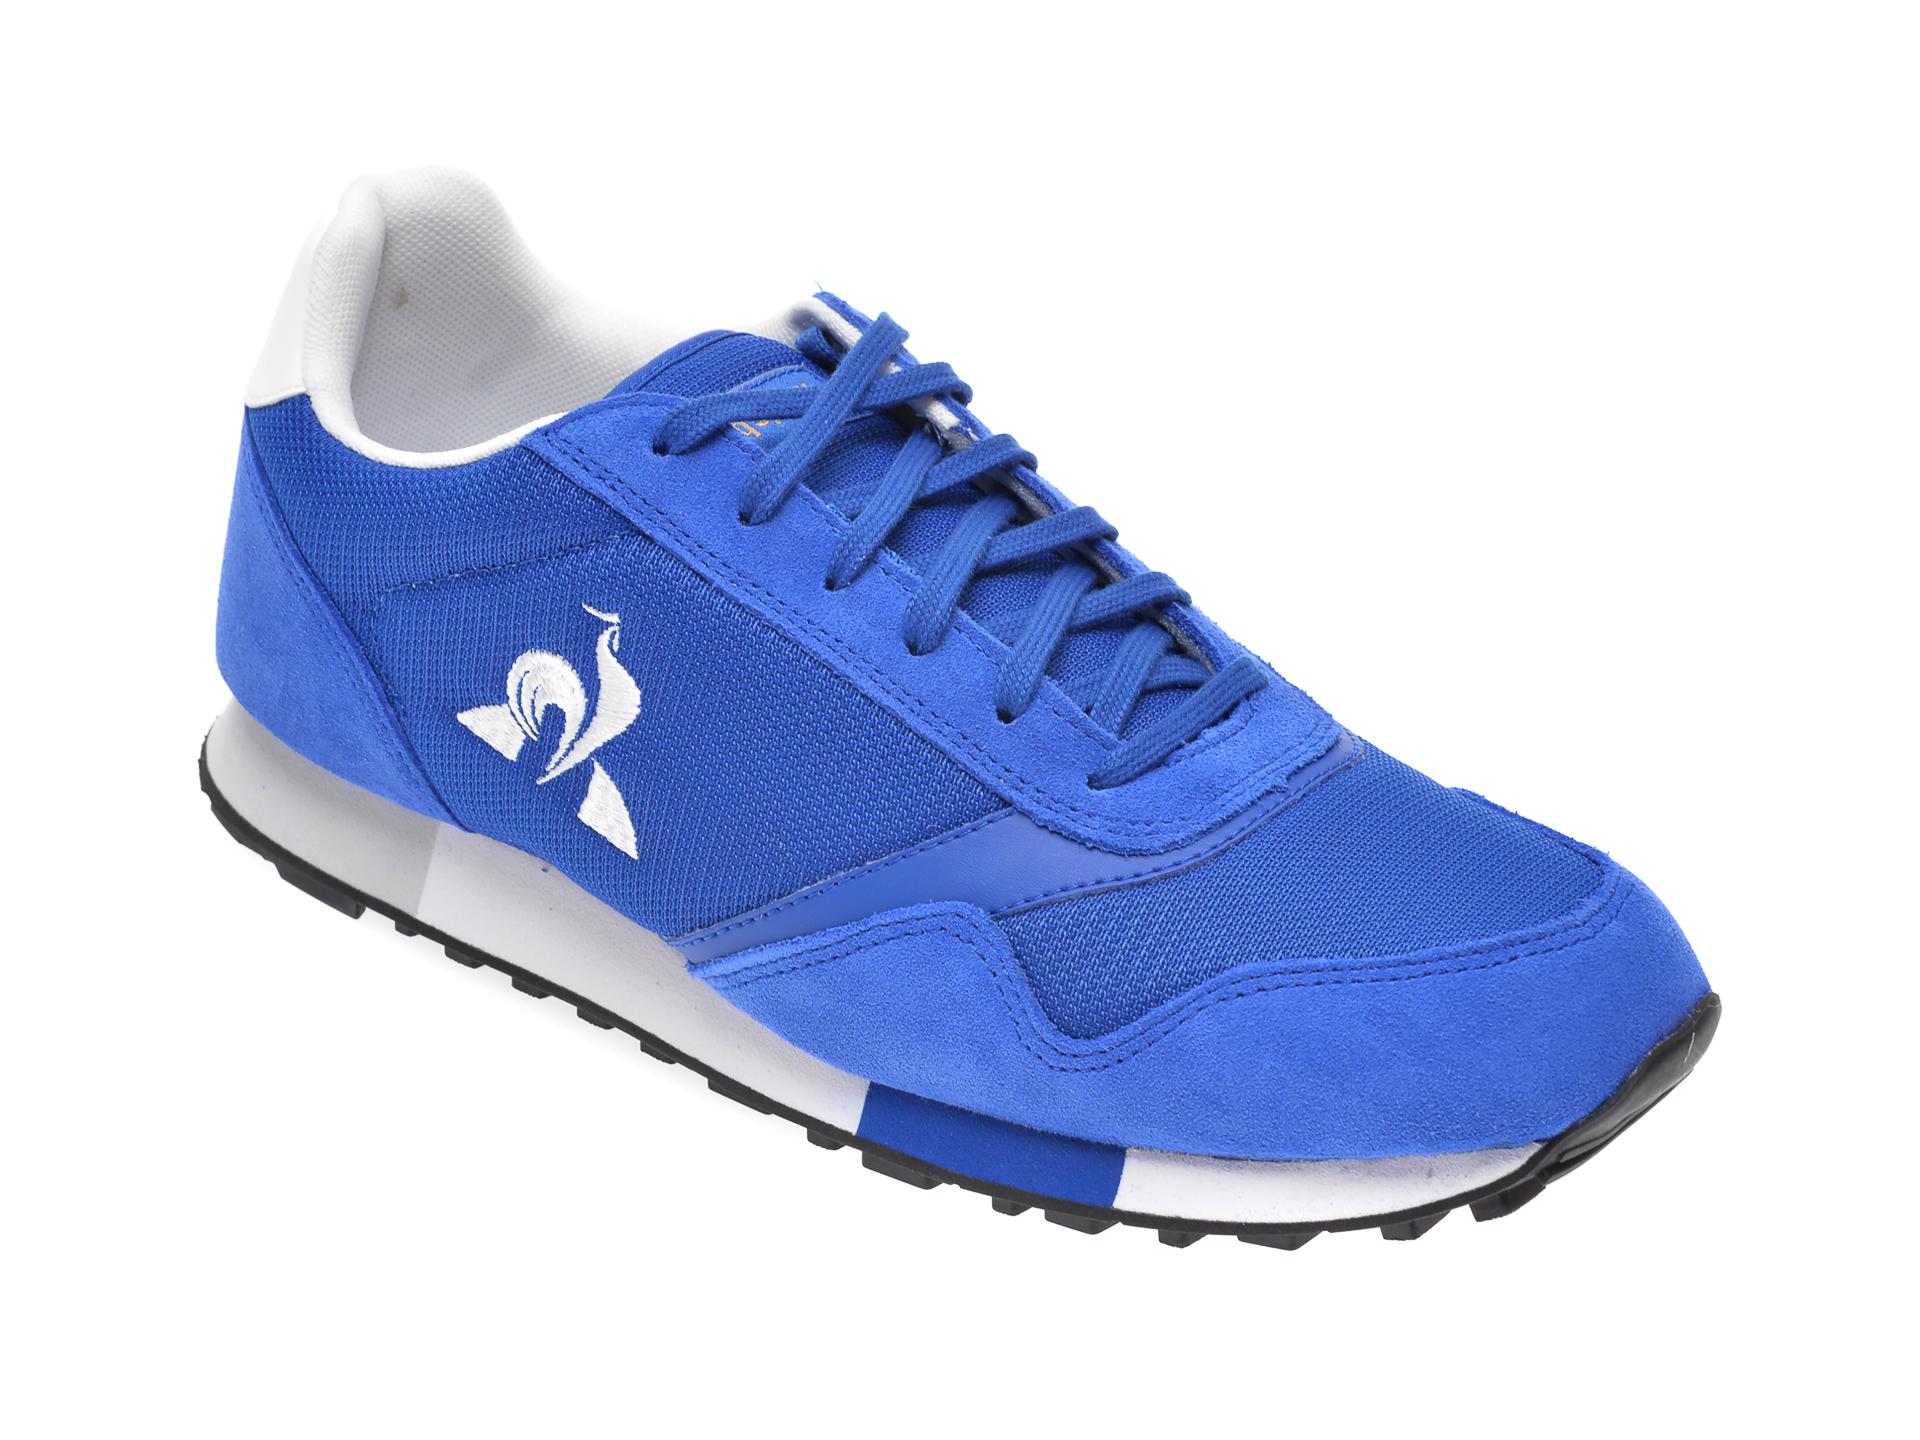 Pantofi sport LE COQ SPORTIF albastri, 2010312, din material textil imagine